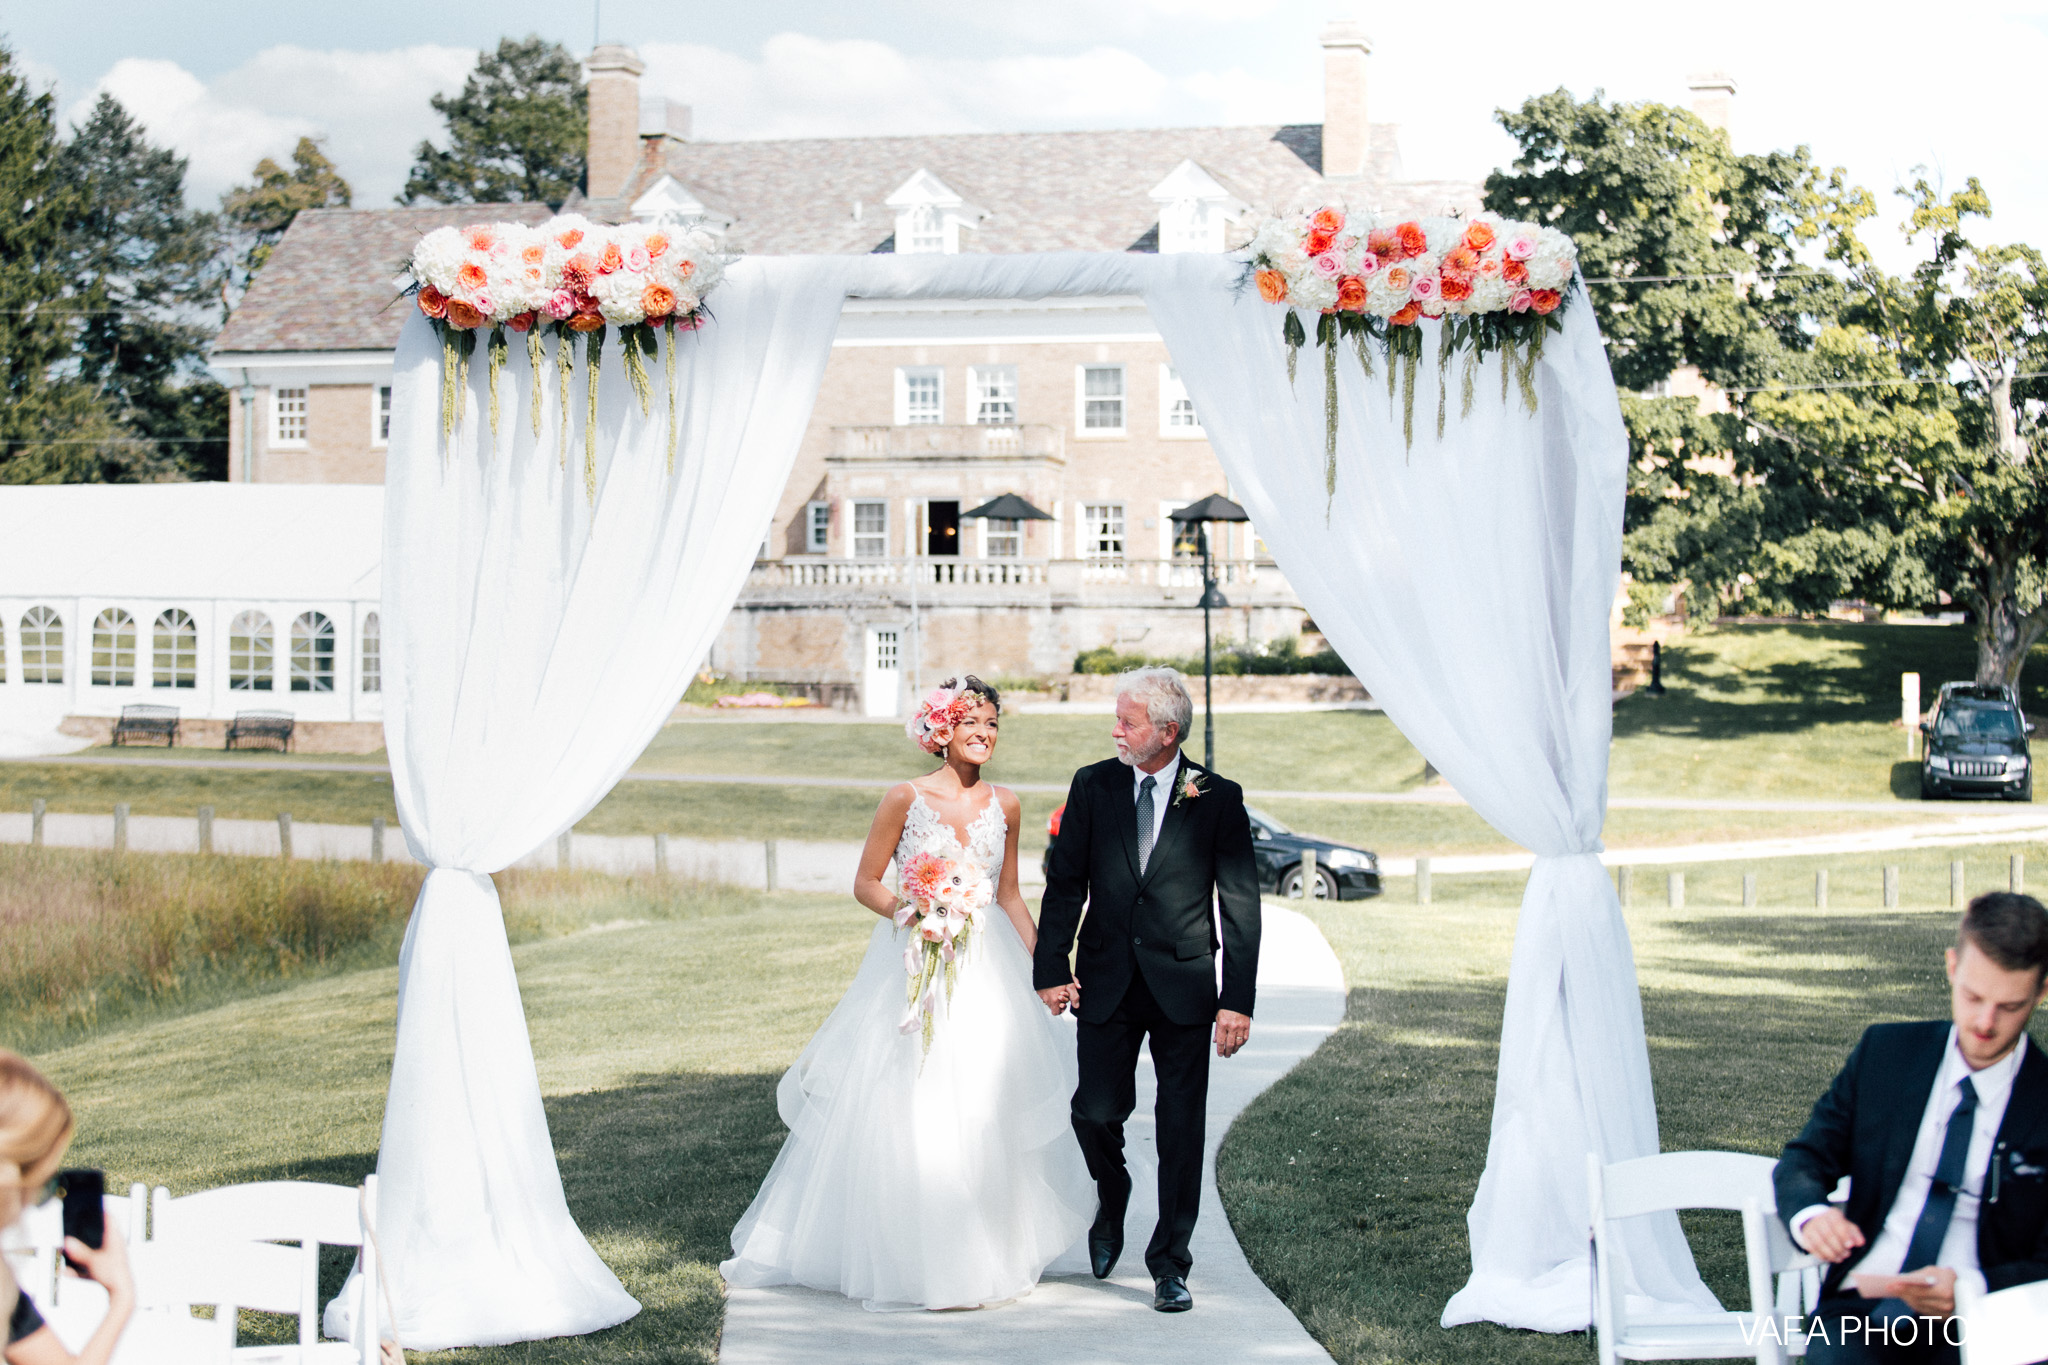 The-Felt-Estate-Wedding-Kailie-David-Vafa-Photo-304.jpg